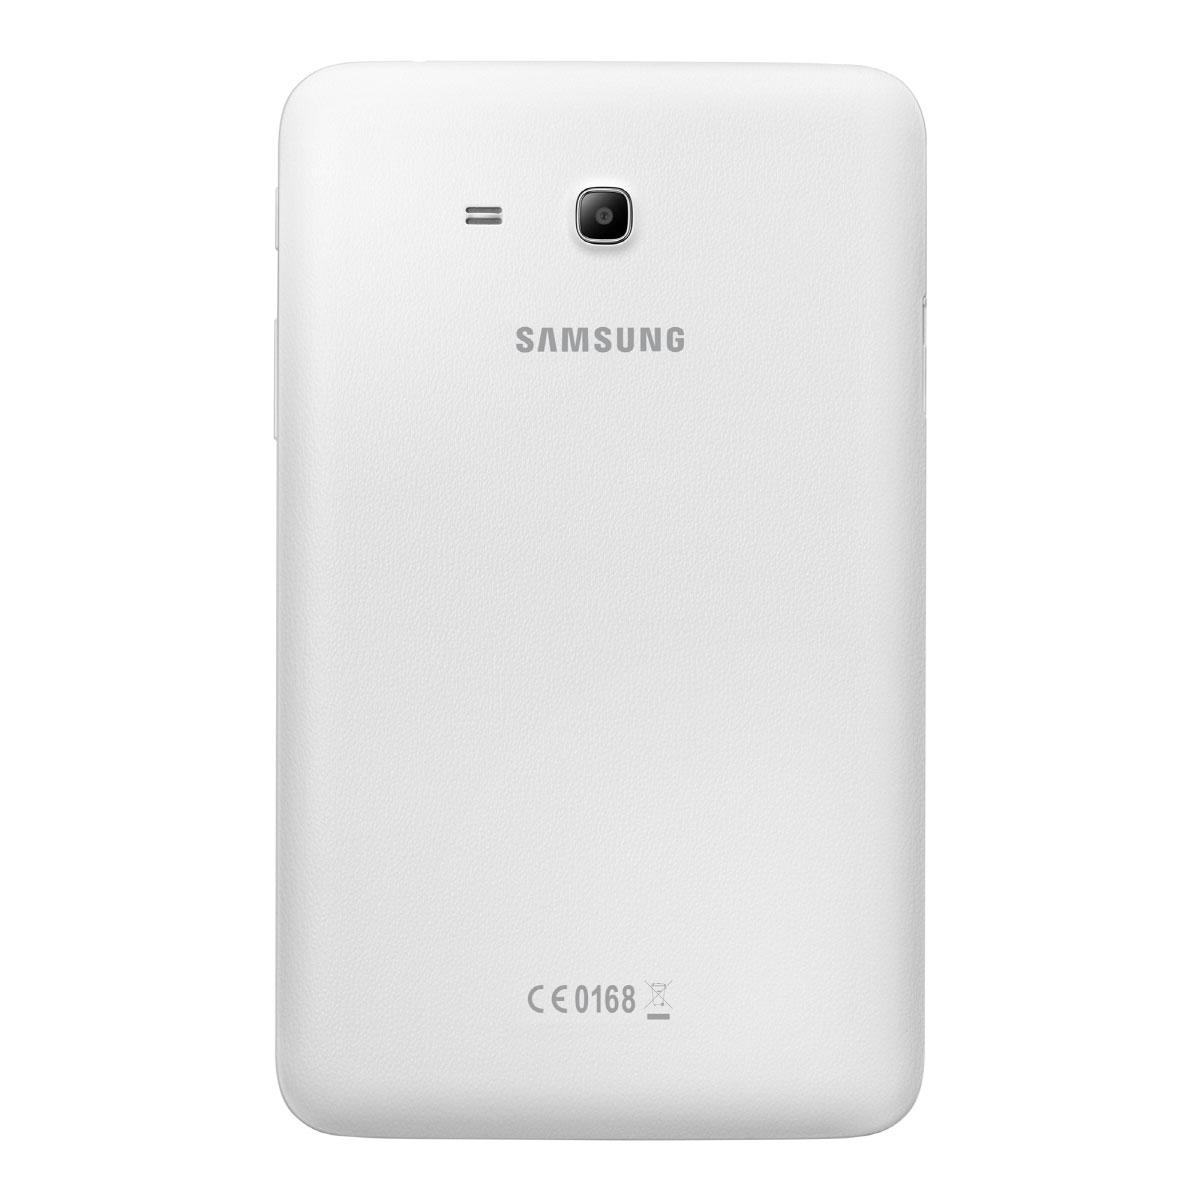 samsung galaxy tab 3 lite 7 8 go tablette tactile sous android 4 2 comparer avec. Black Bedroom Furniture Sets. Home Design Ideas